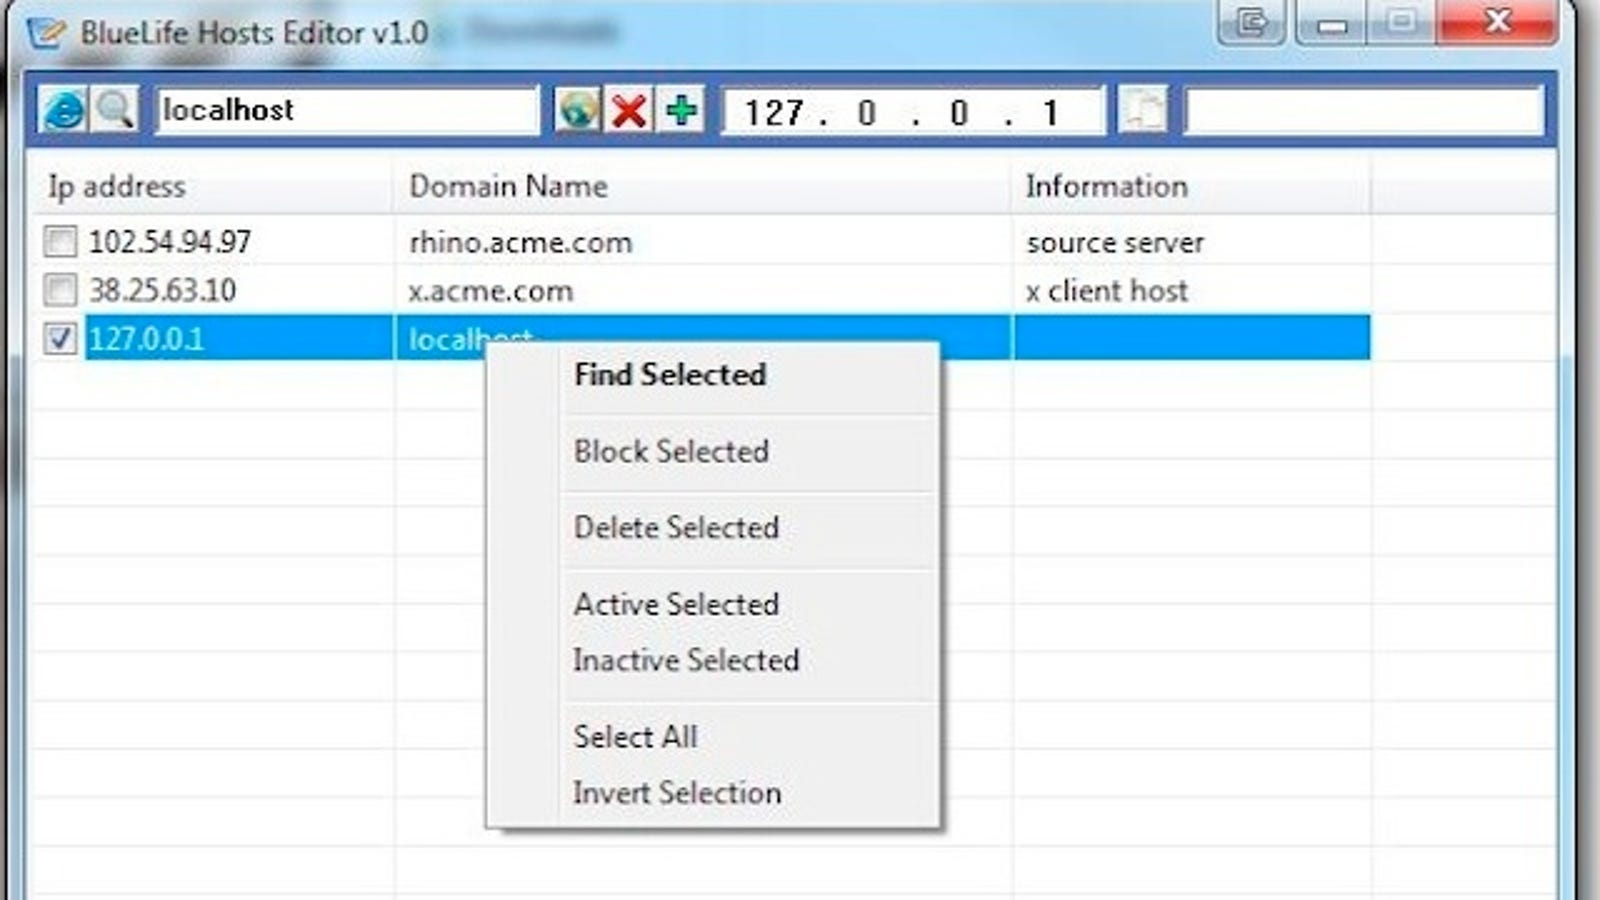 bluelife hosts editor download